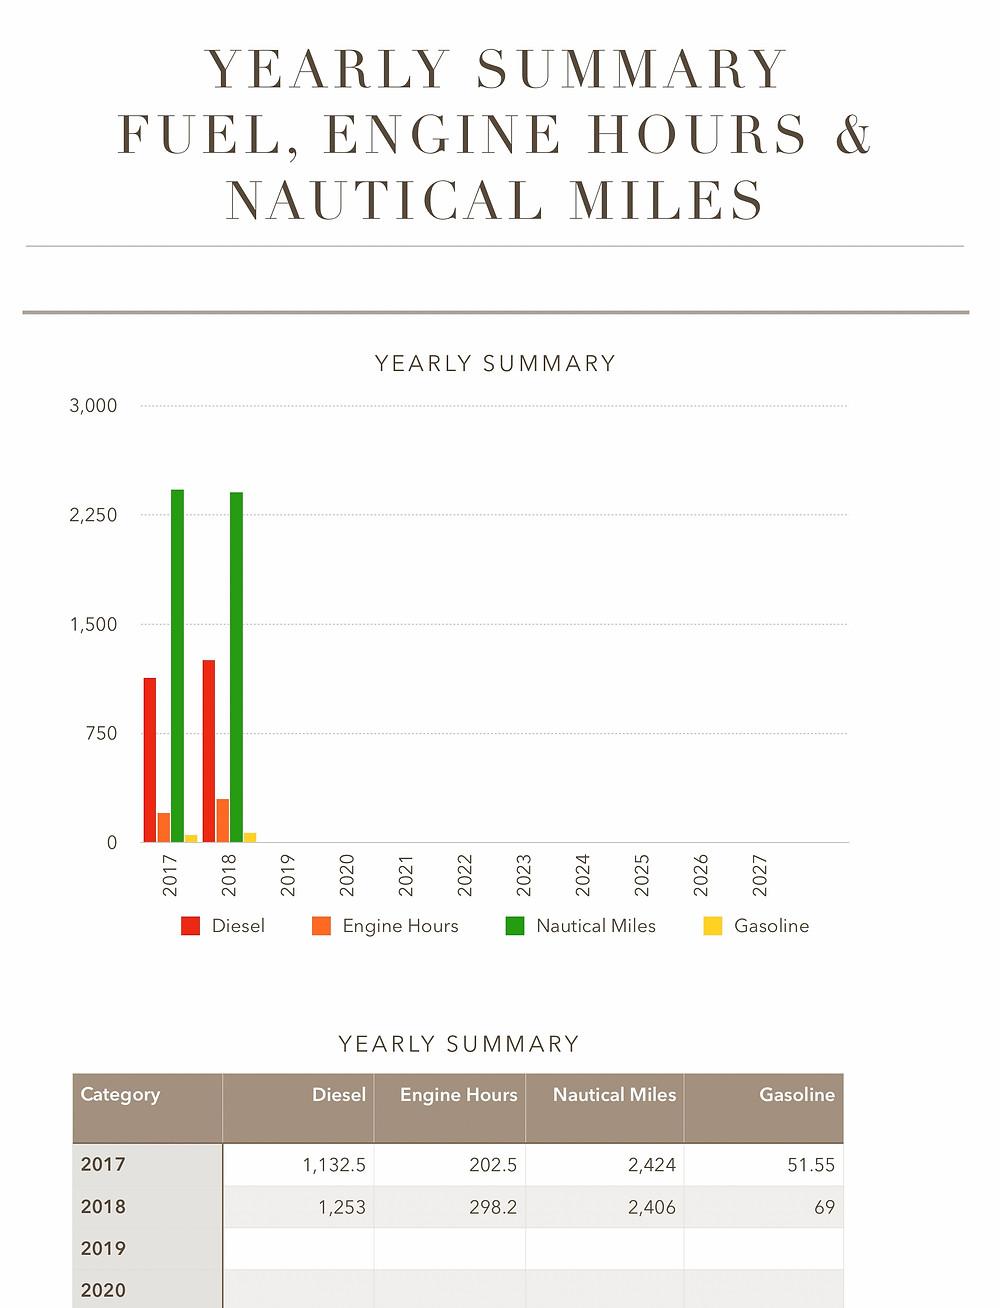 2017 & 2018 Fuel, engine & nautical miles summary